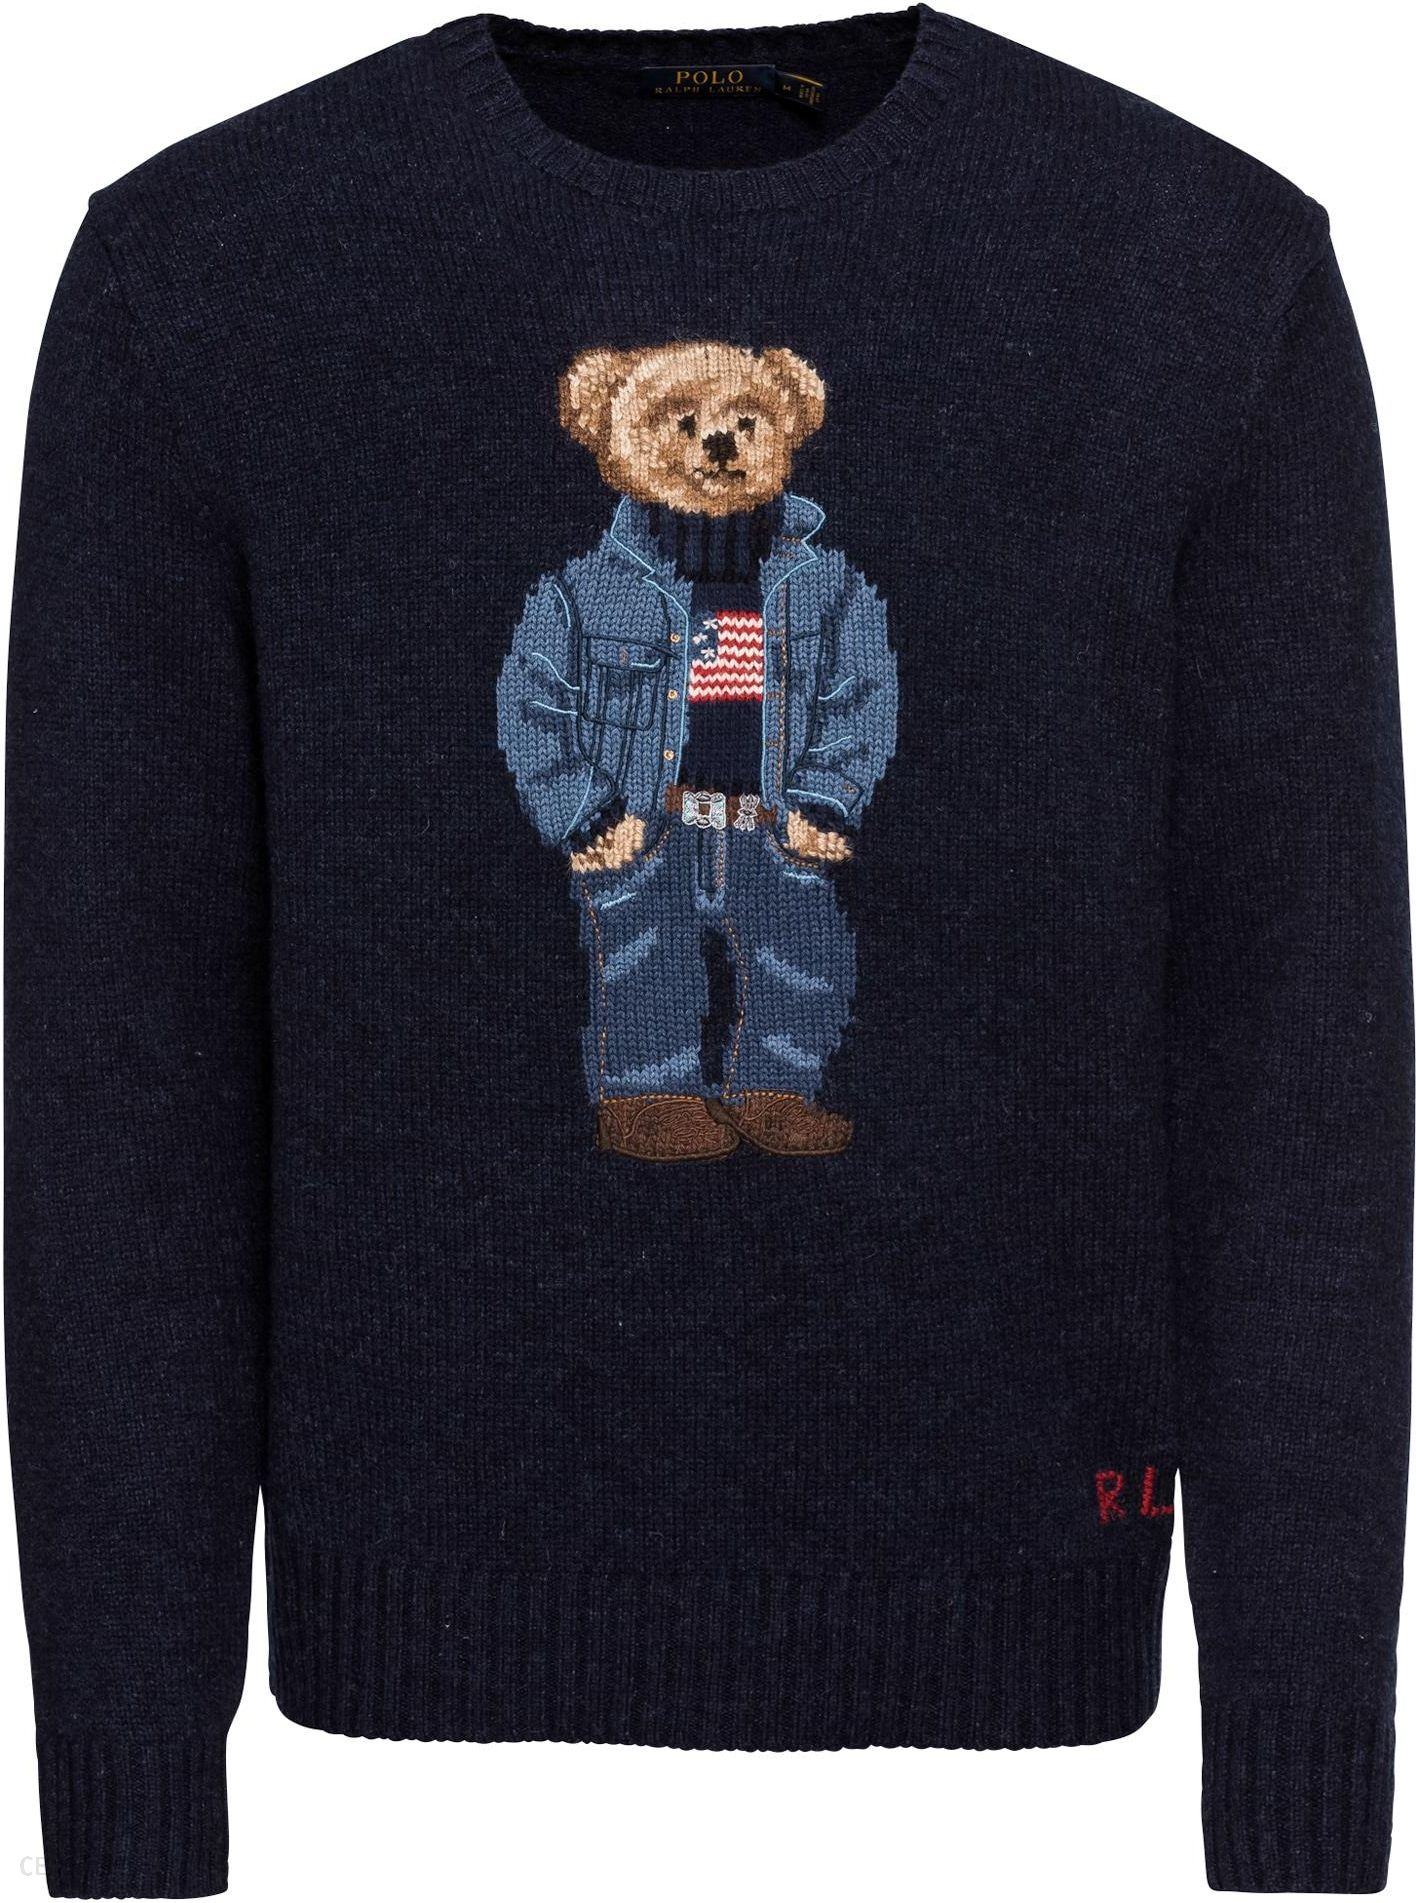 POLO RALPH LAUREN Sweter  WOOL-LS CN DENIM BEAR  - Ceny i opinie ... ba84bb00cd